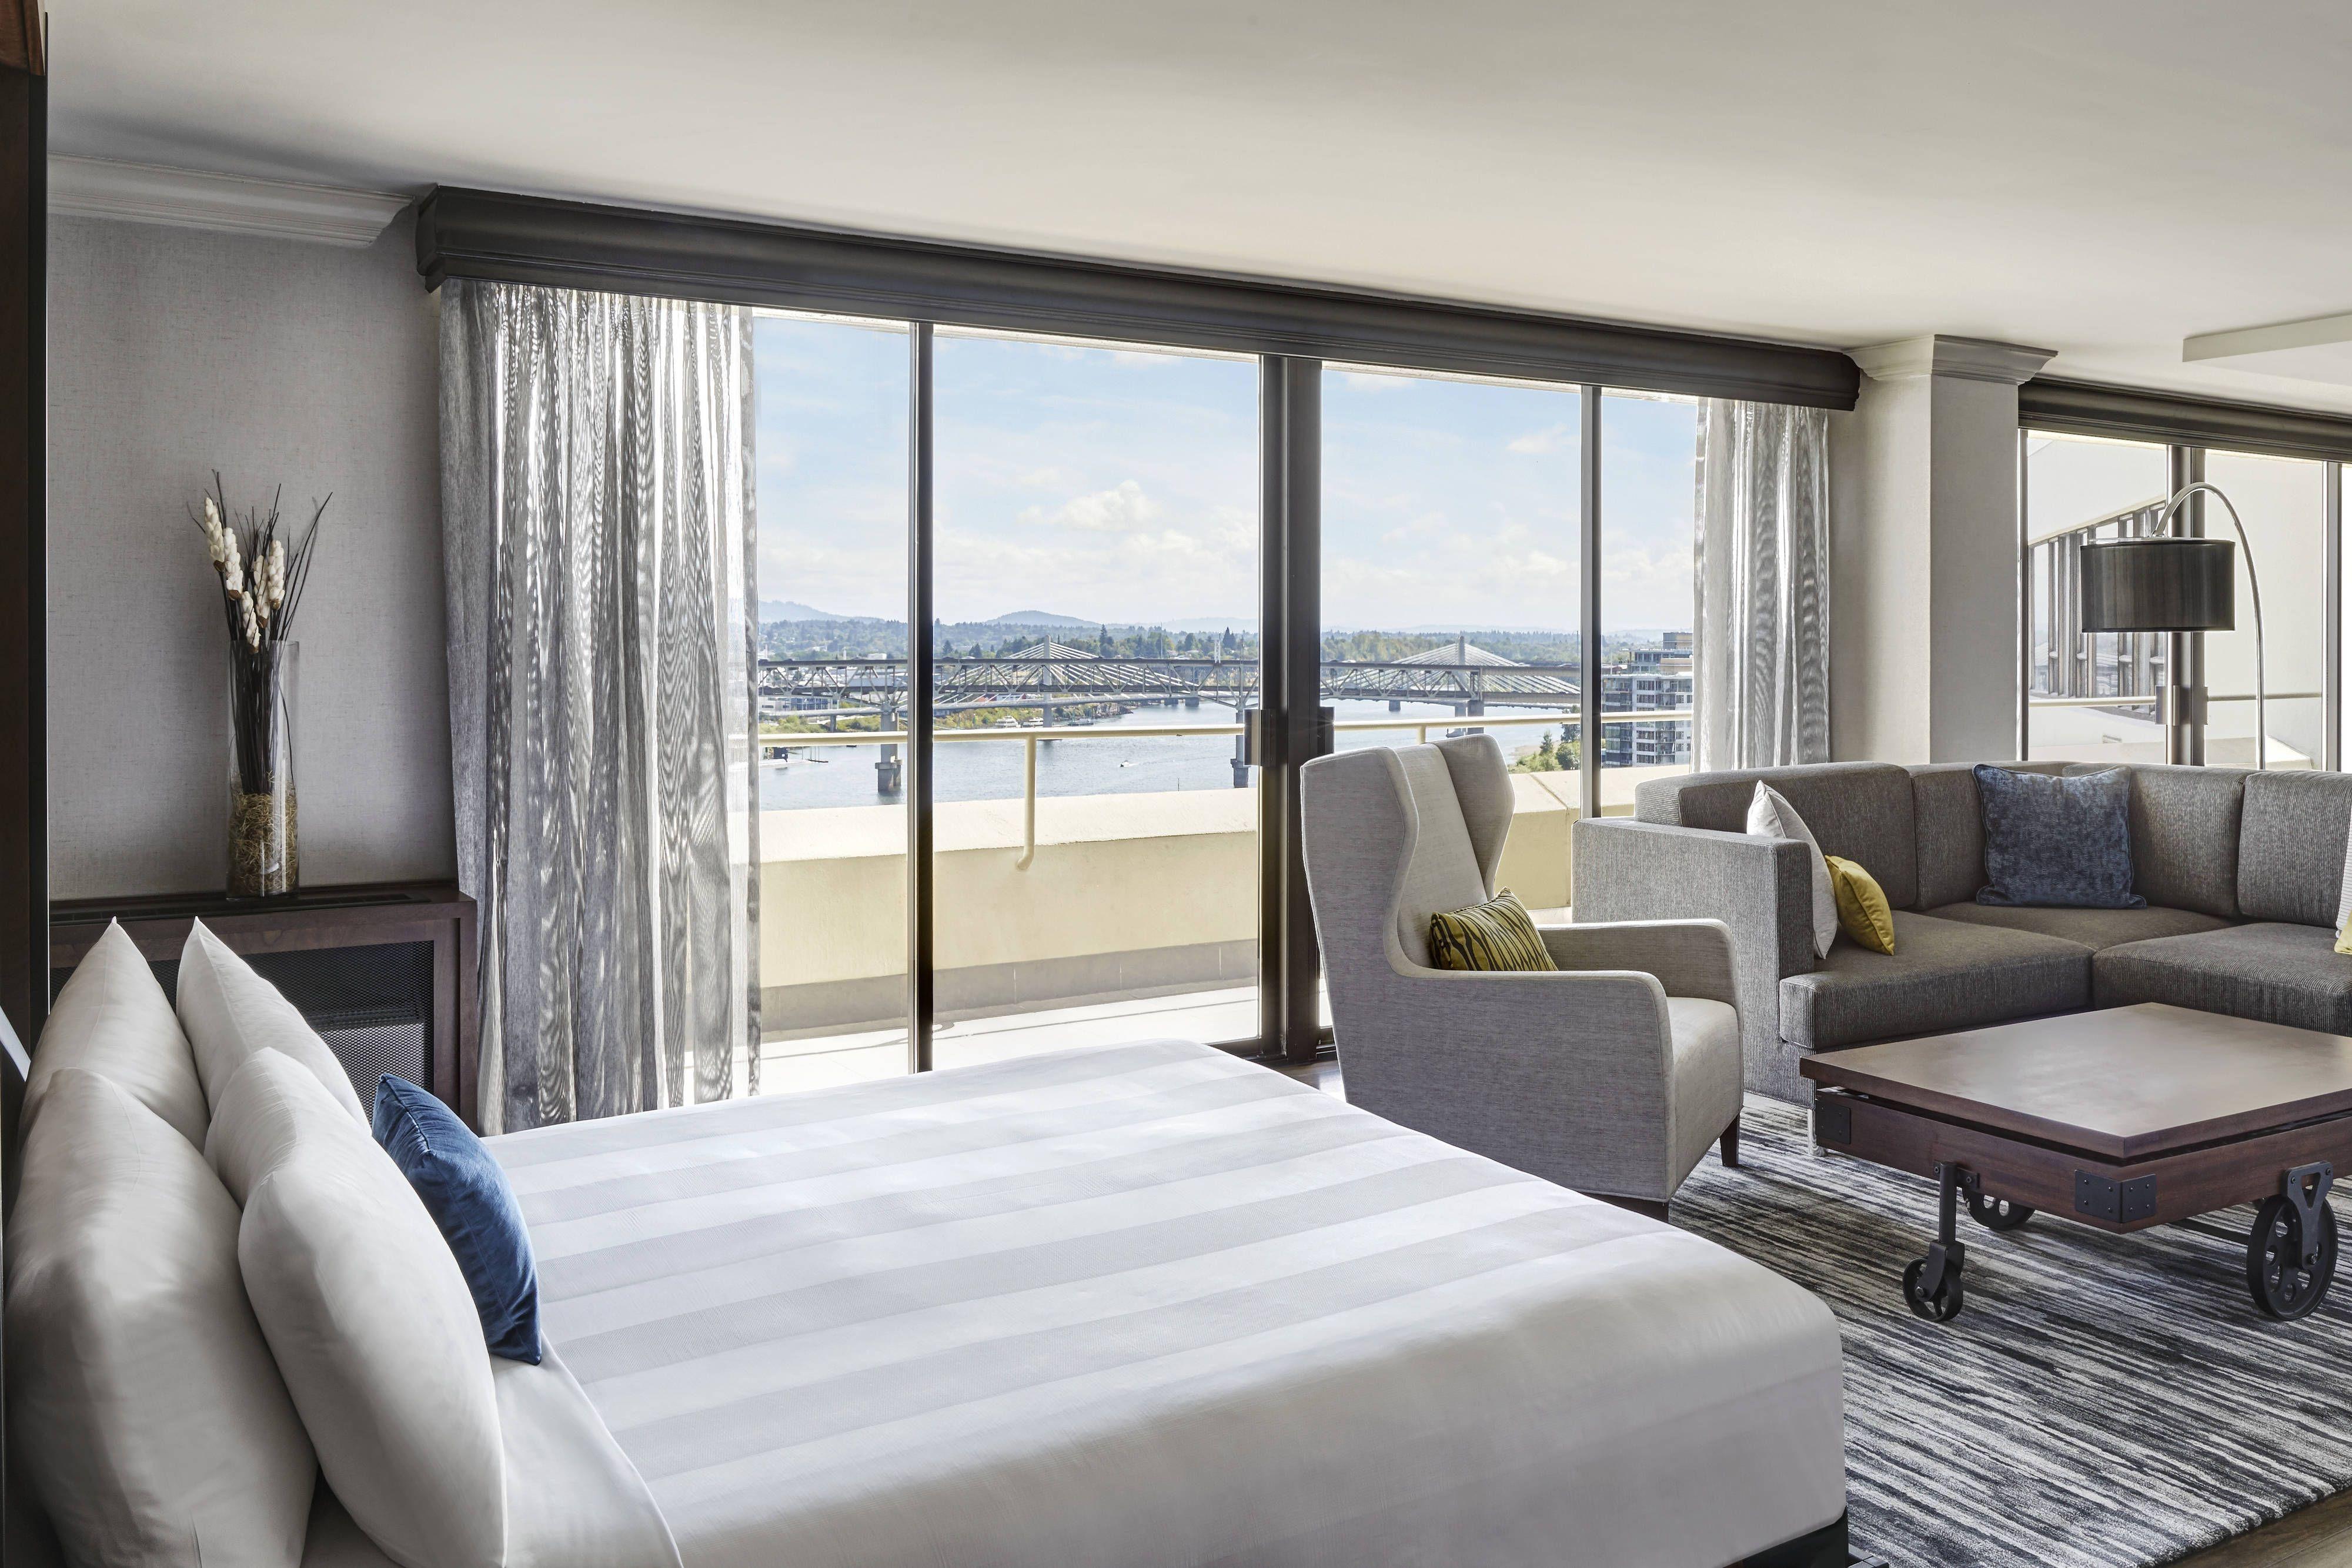 portland marriott downtown waterfront presidential suite bedroom rh pinterest com